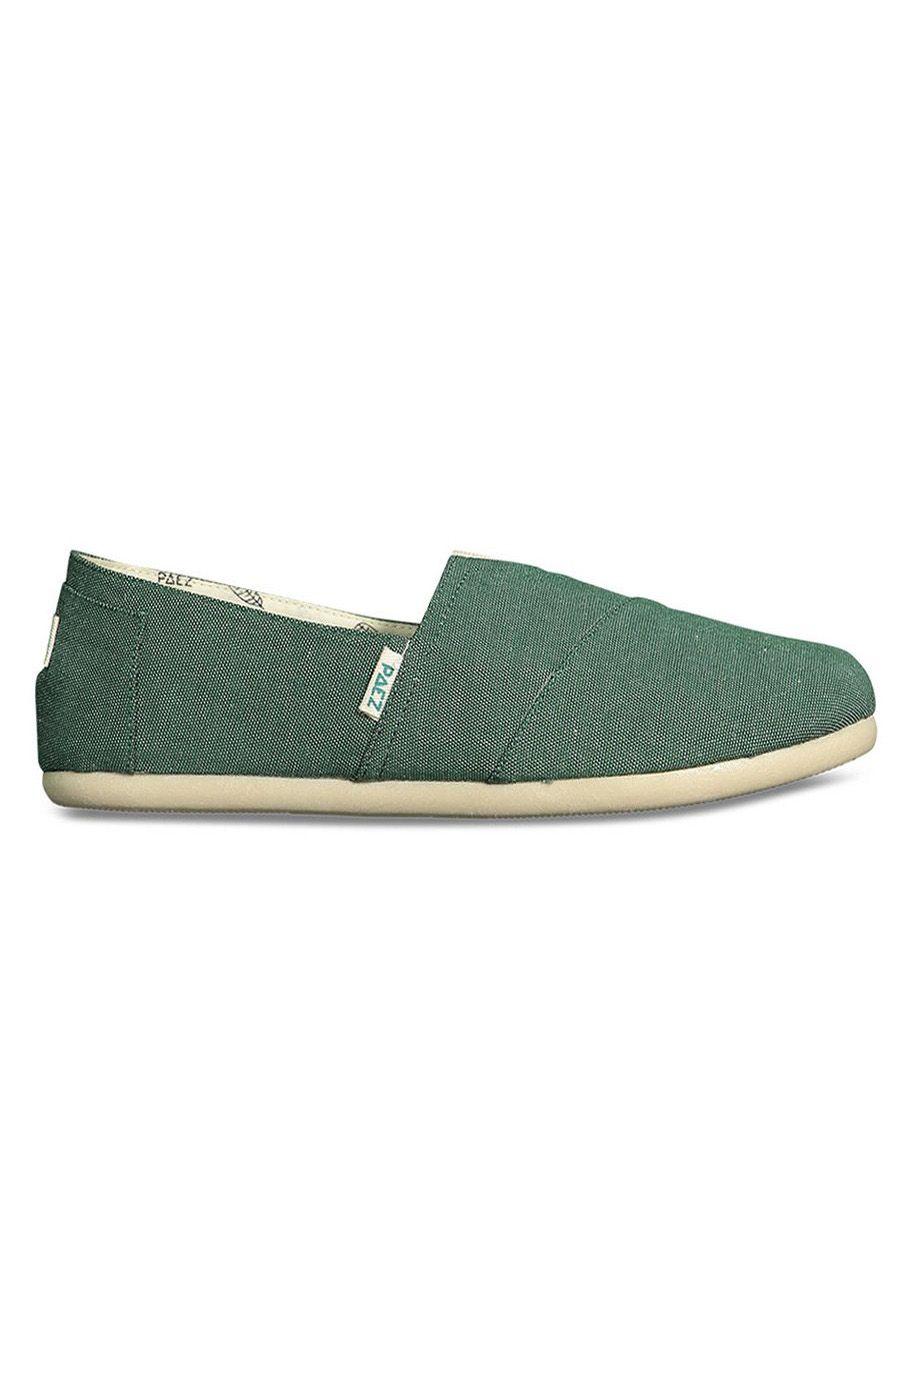 Paez Sandals COMBI Green